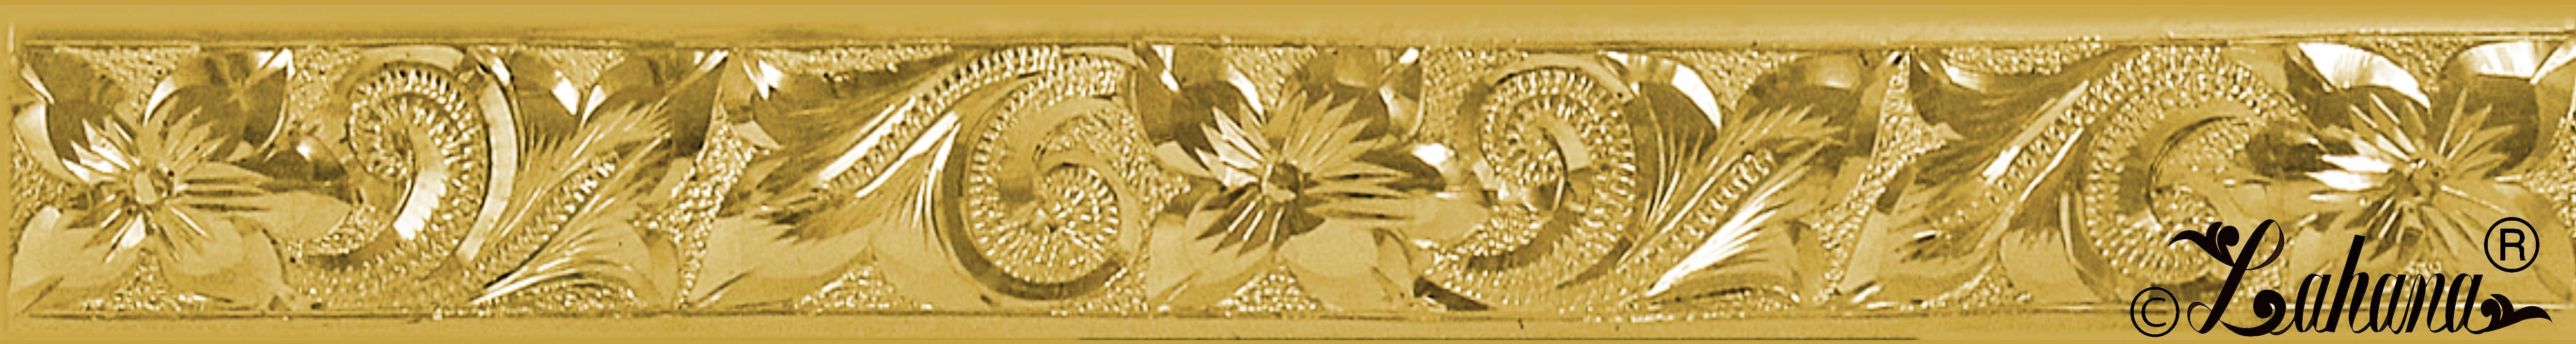 sample-logo-14k-td-c.jpg